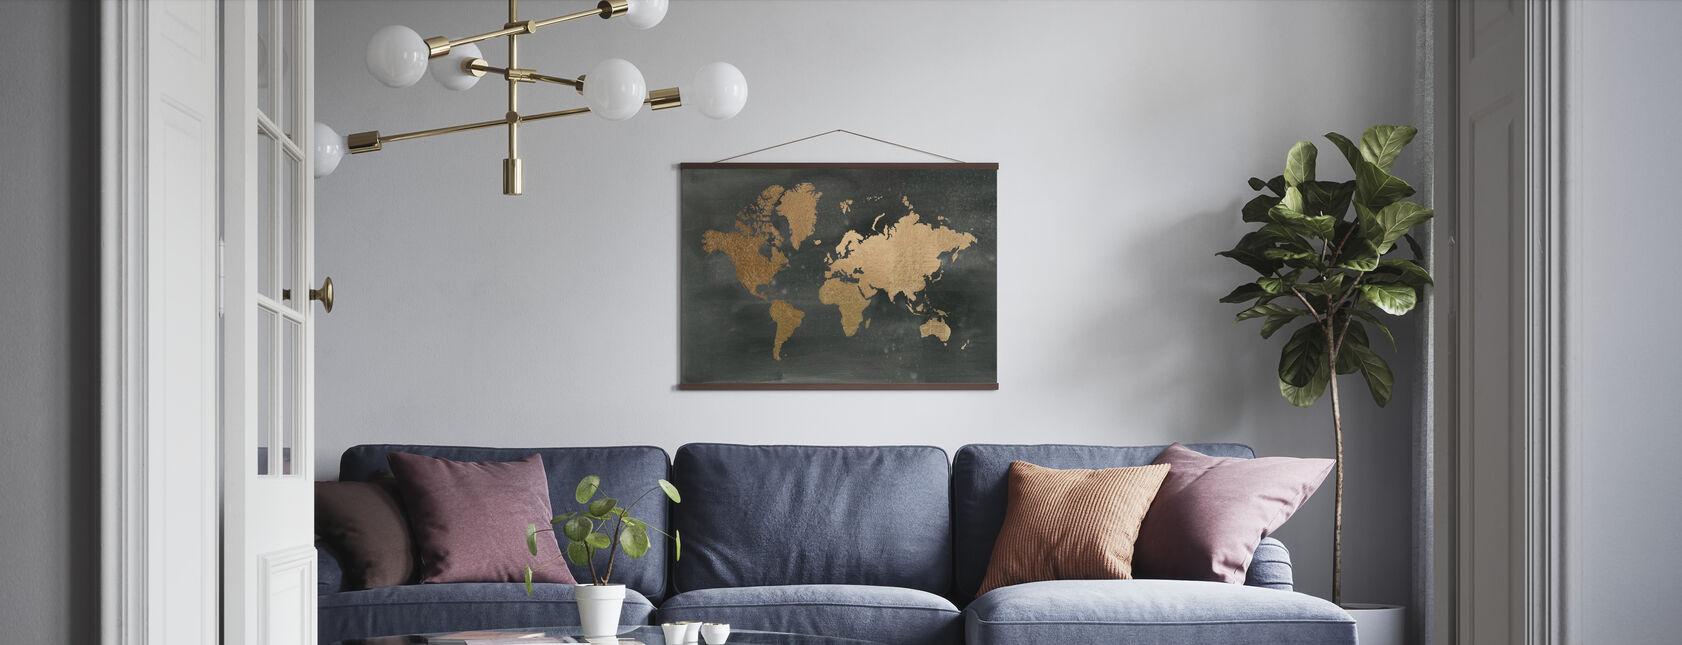 World Map on Black Wash - Poster - Living Room